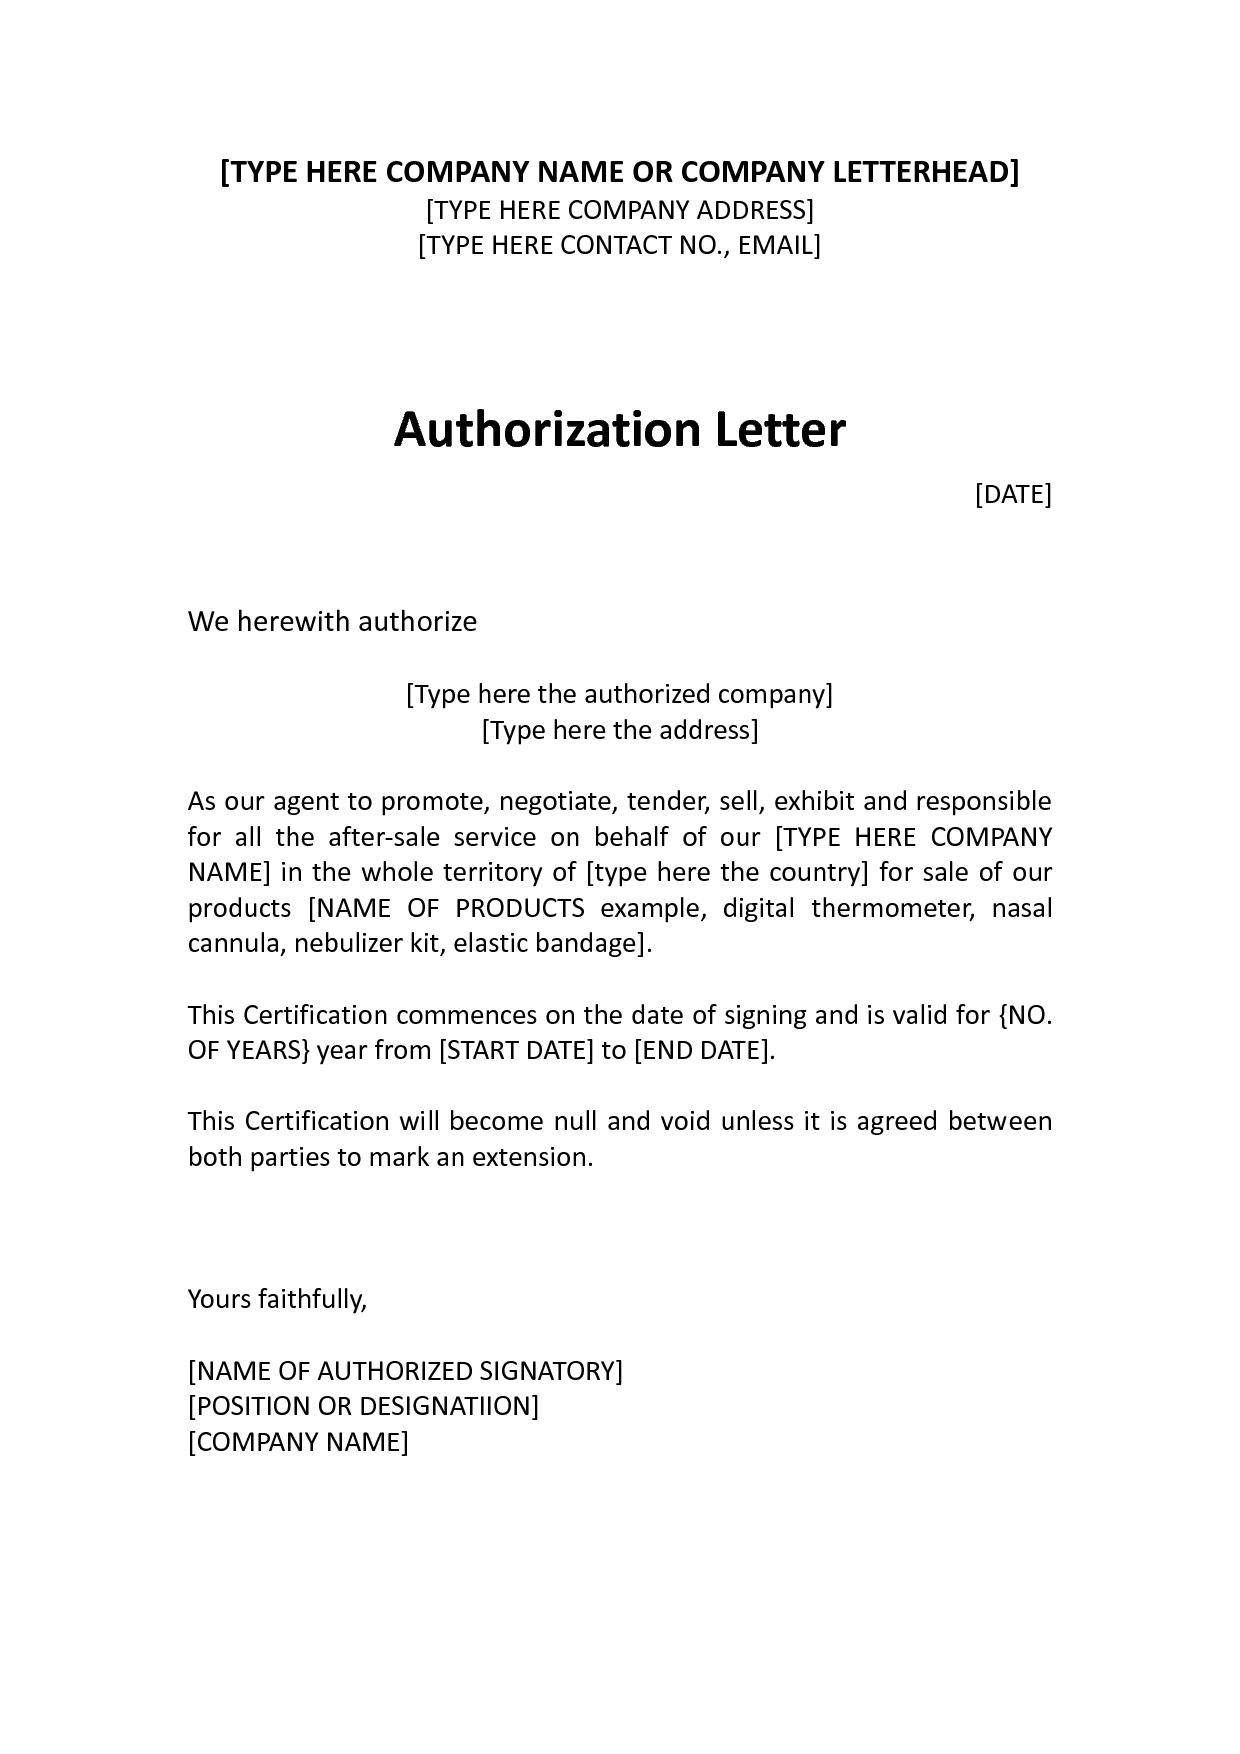 Constructive Eviction Letter Template - Authorization Distributor Letter Sample Distributor Dealer